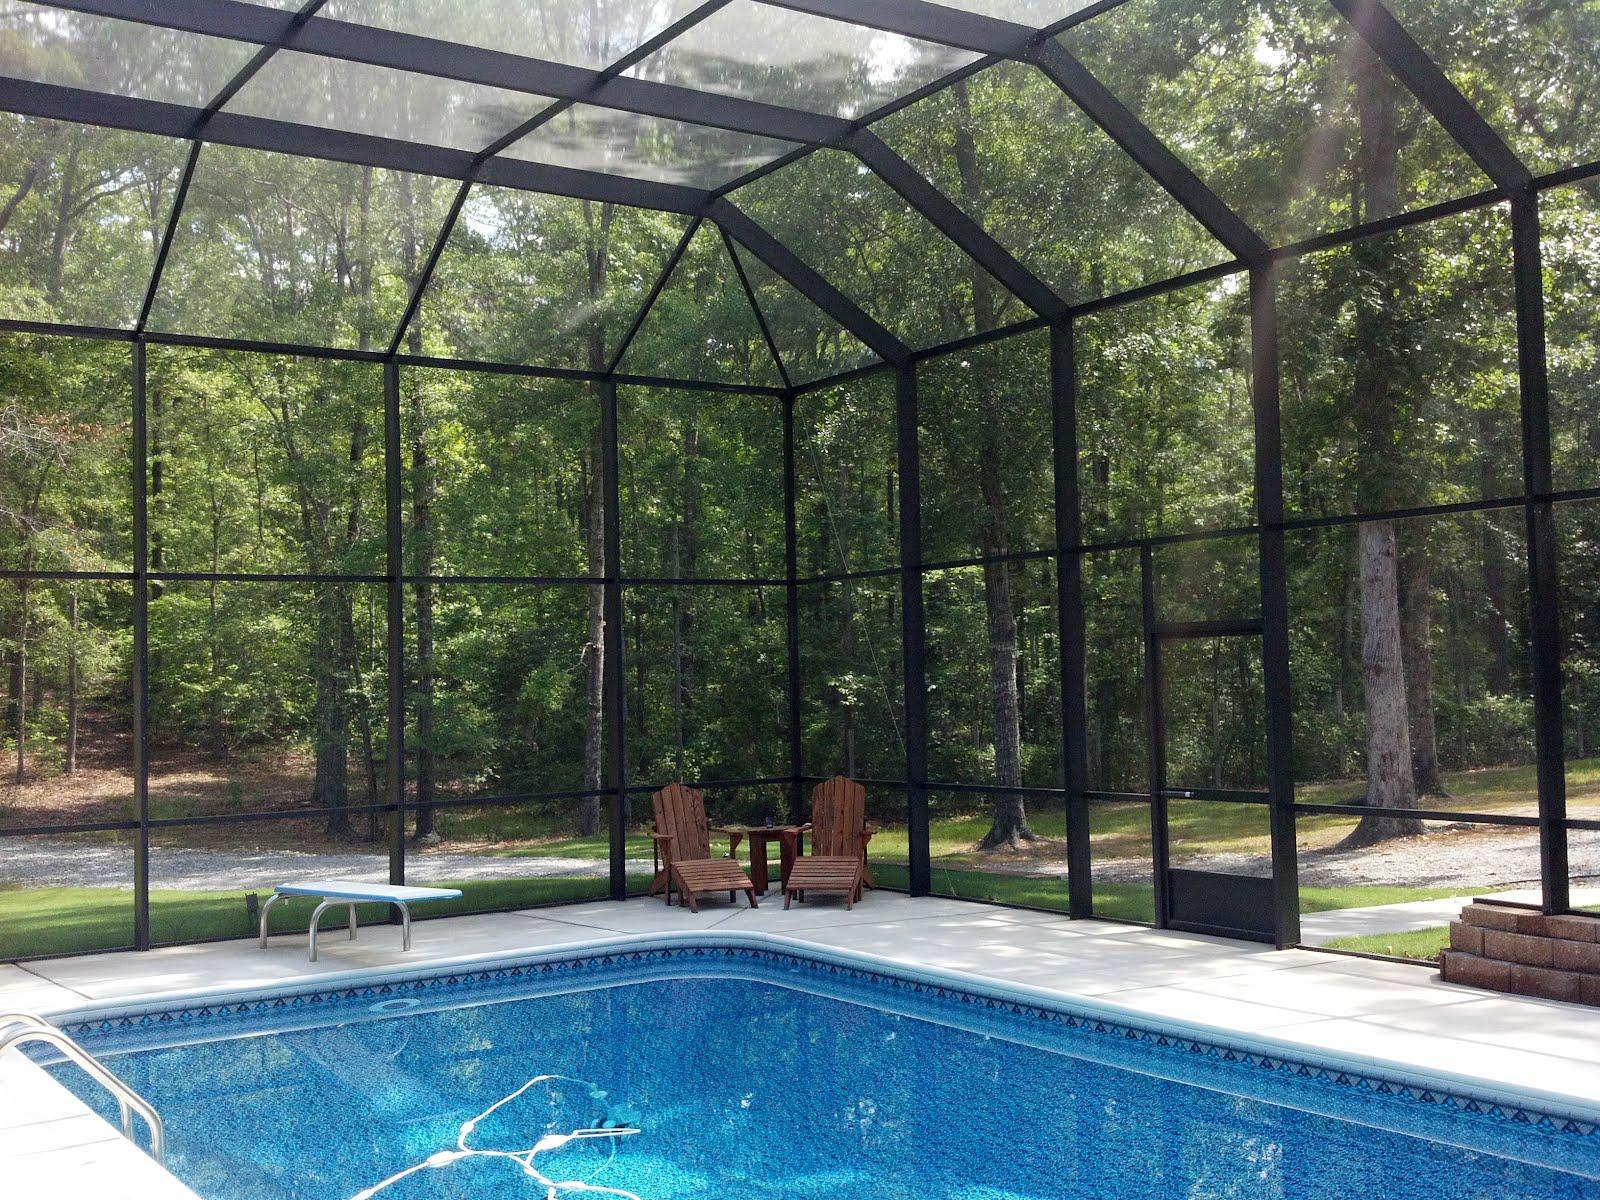 Pool Enclosures Usa Fortson Georgia Pool Enclosure Project